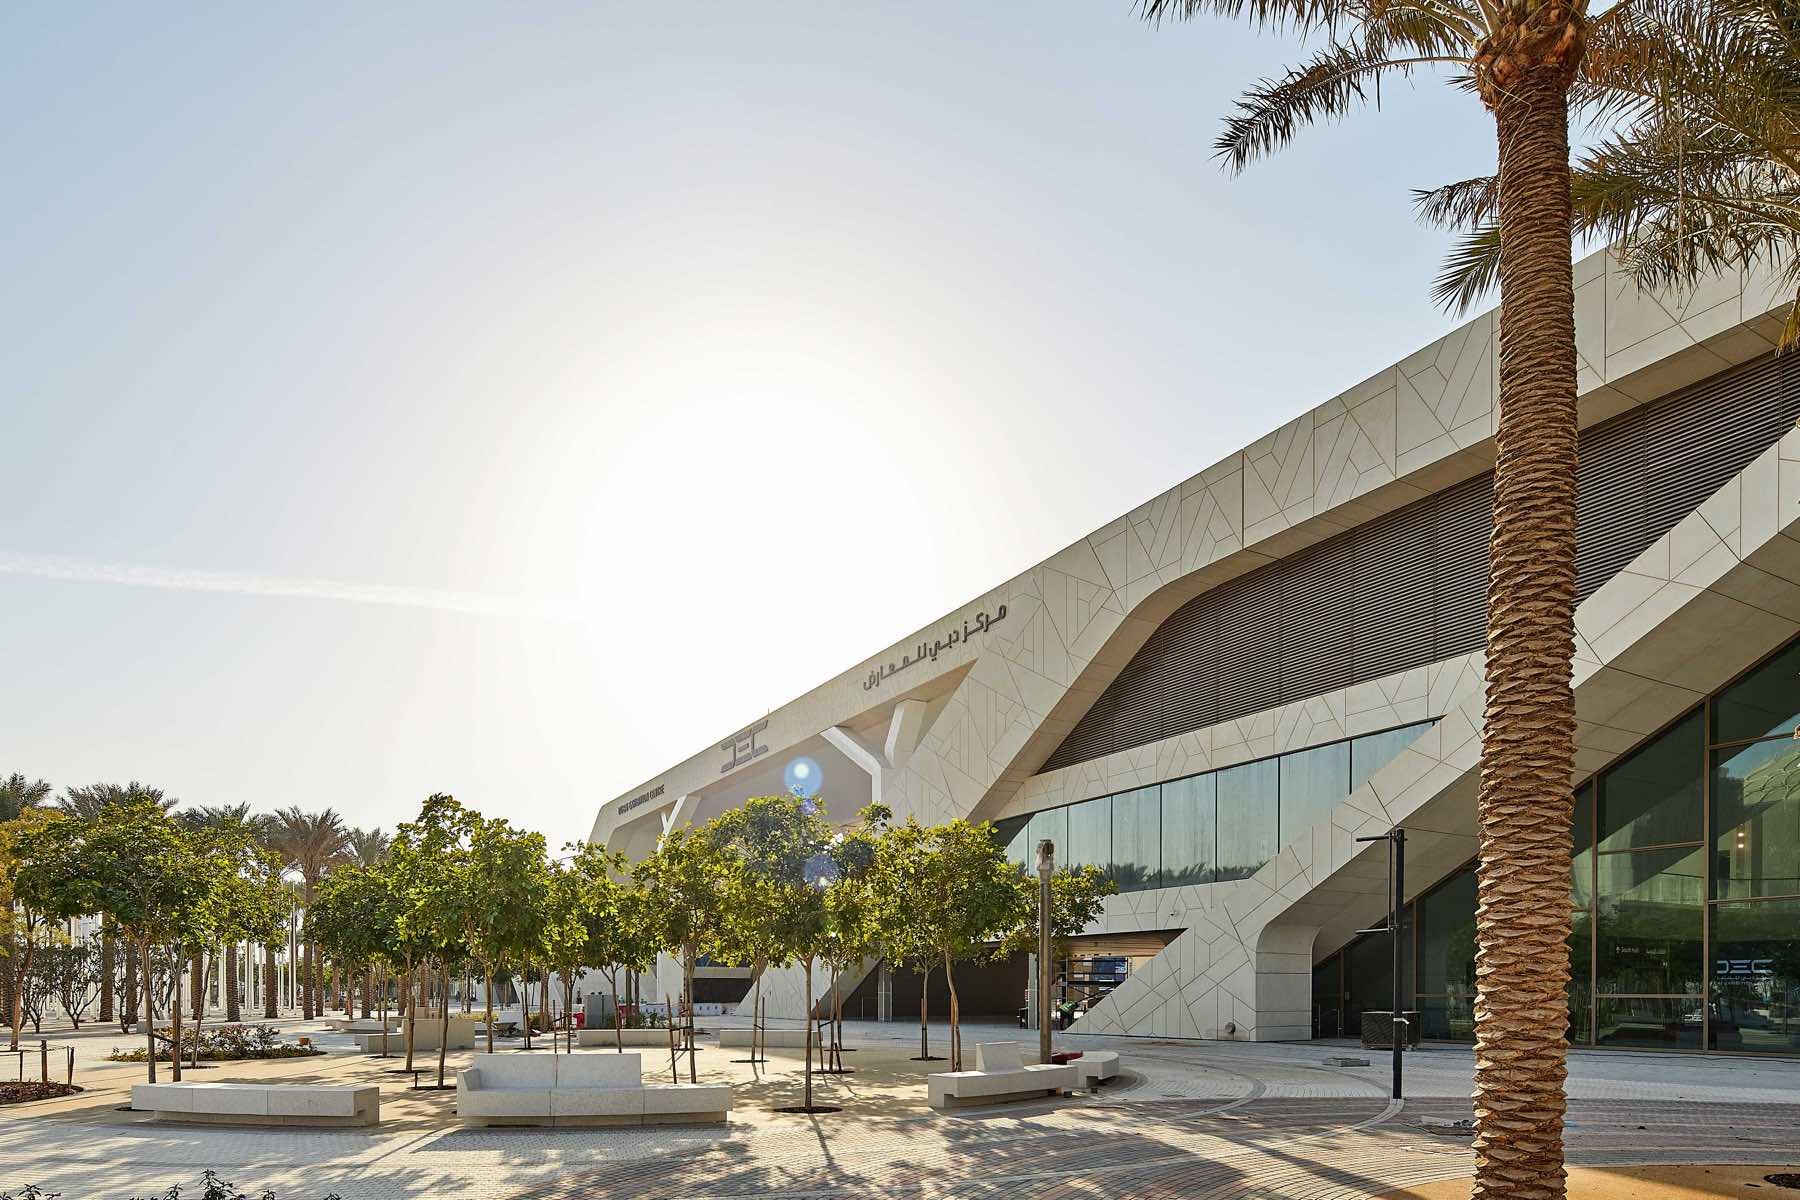 Dubai Exhibition Centre